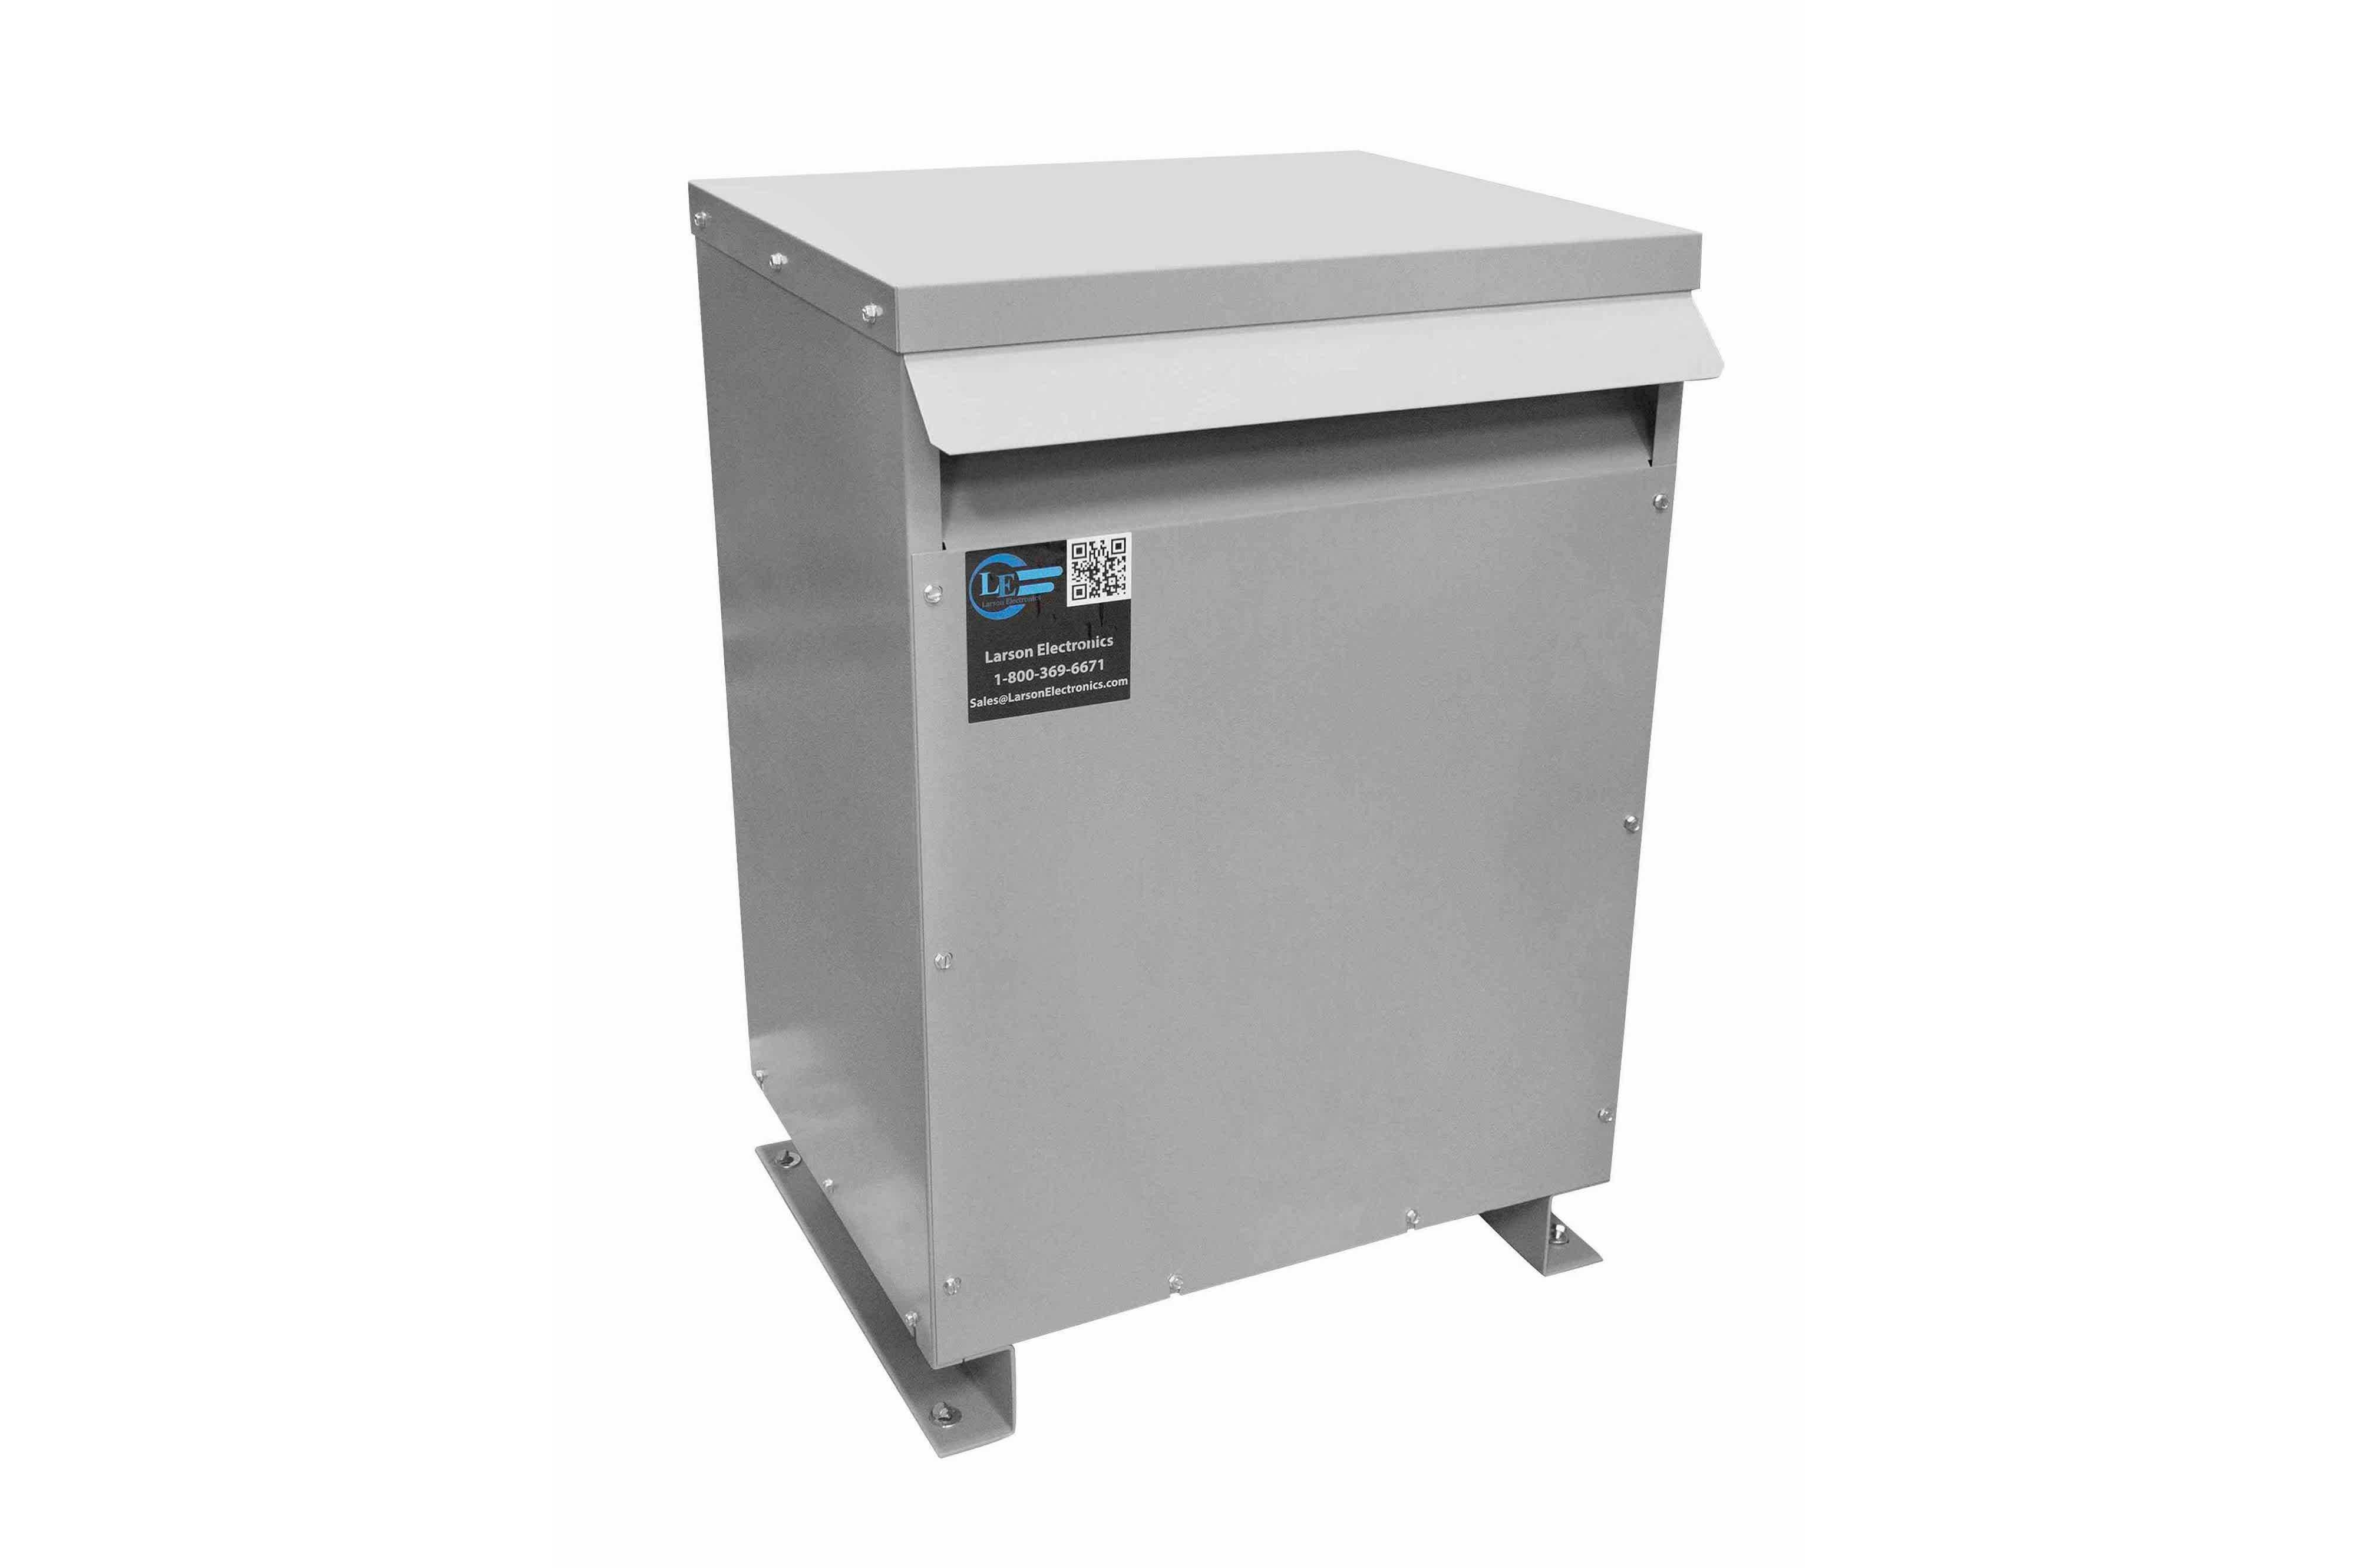 80 kVA 3PH DOE Transformer, 460V Delta Primary, 380Y/220 Wye-N Secondary, N3R, Ventilated, 60 Hz